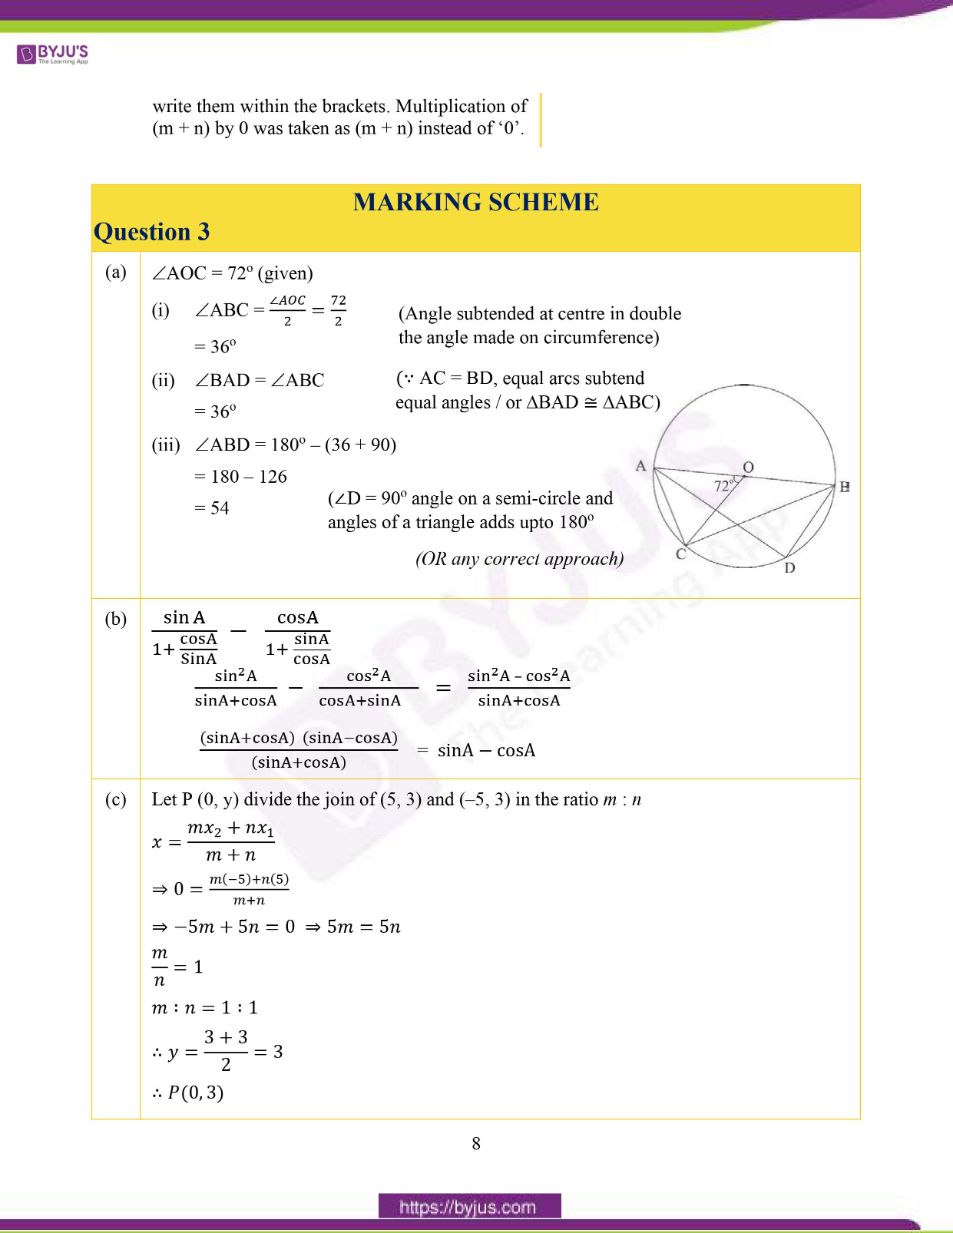 ICSE Class 10 Maths Question Paper Solution 2020